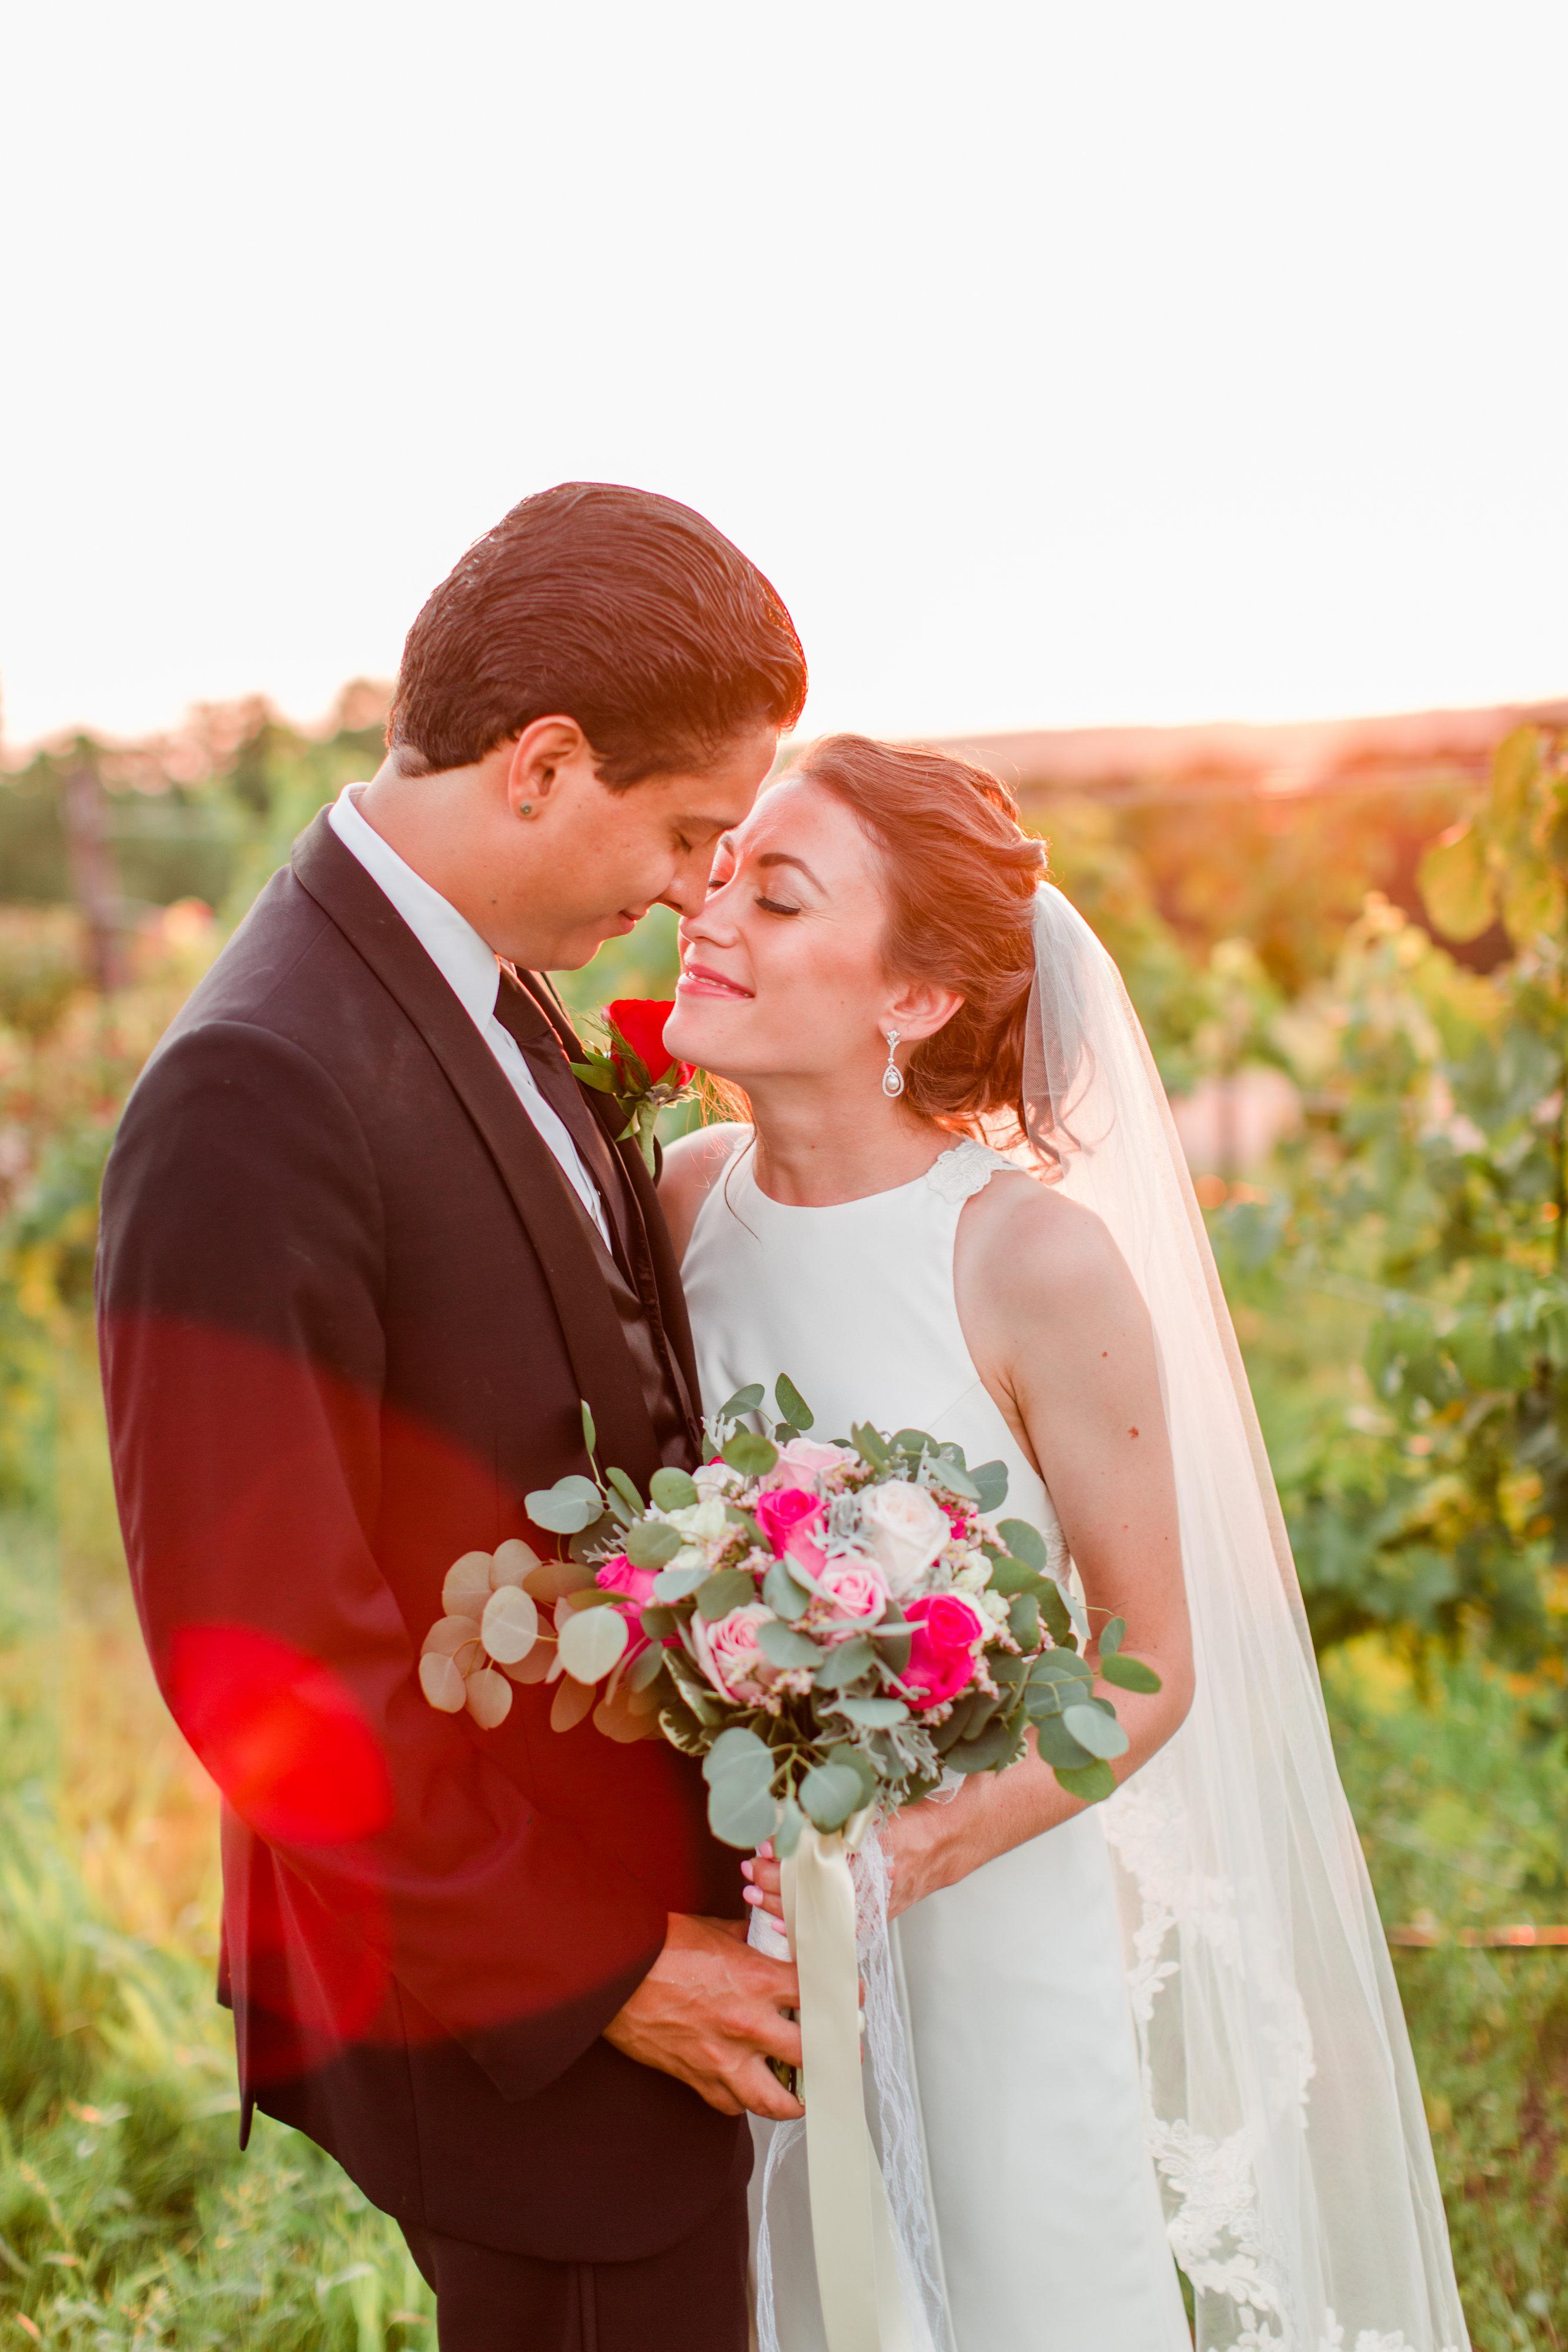 Jennifer & Renan's Winery Wedding